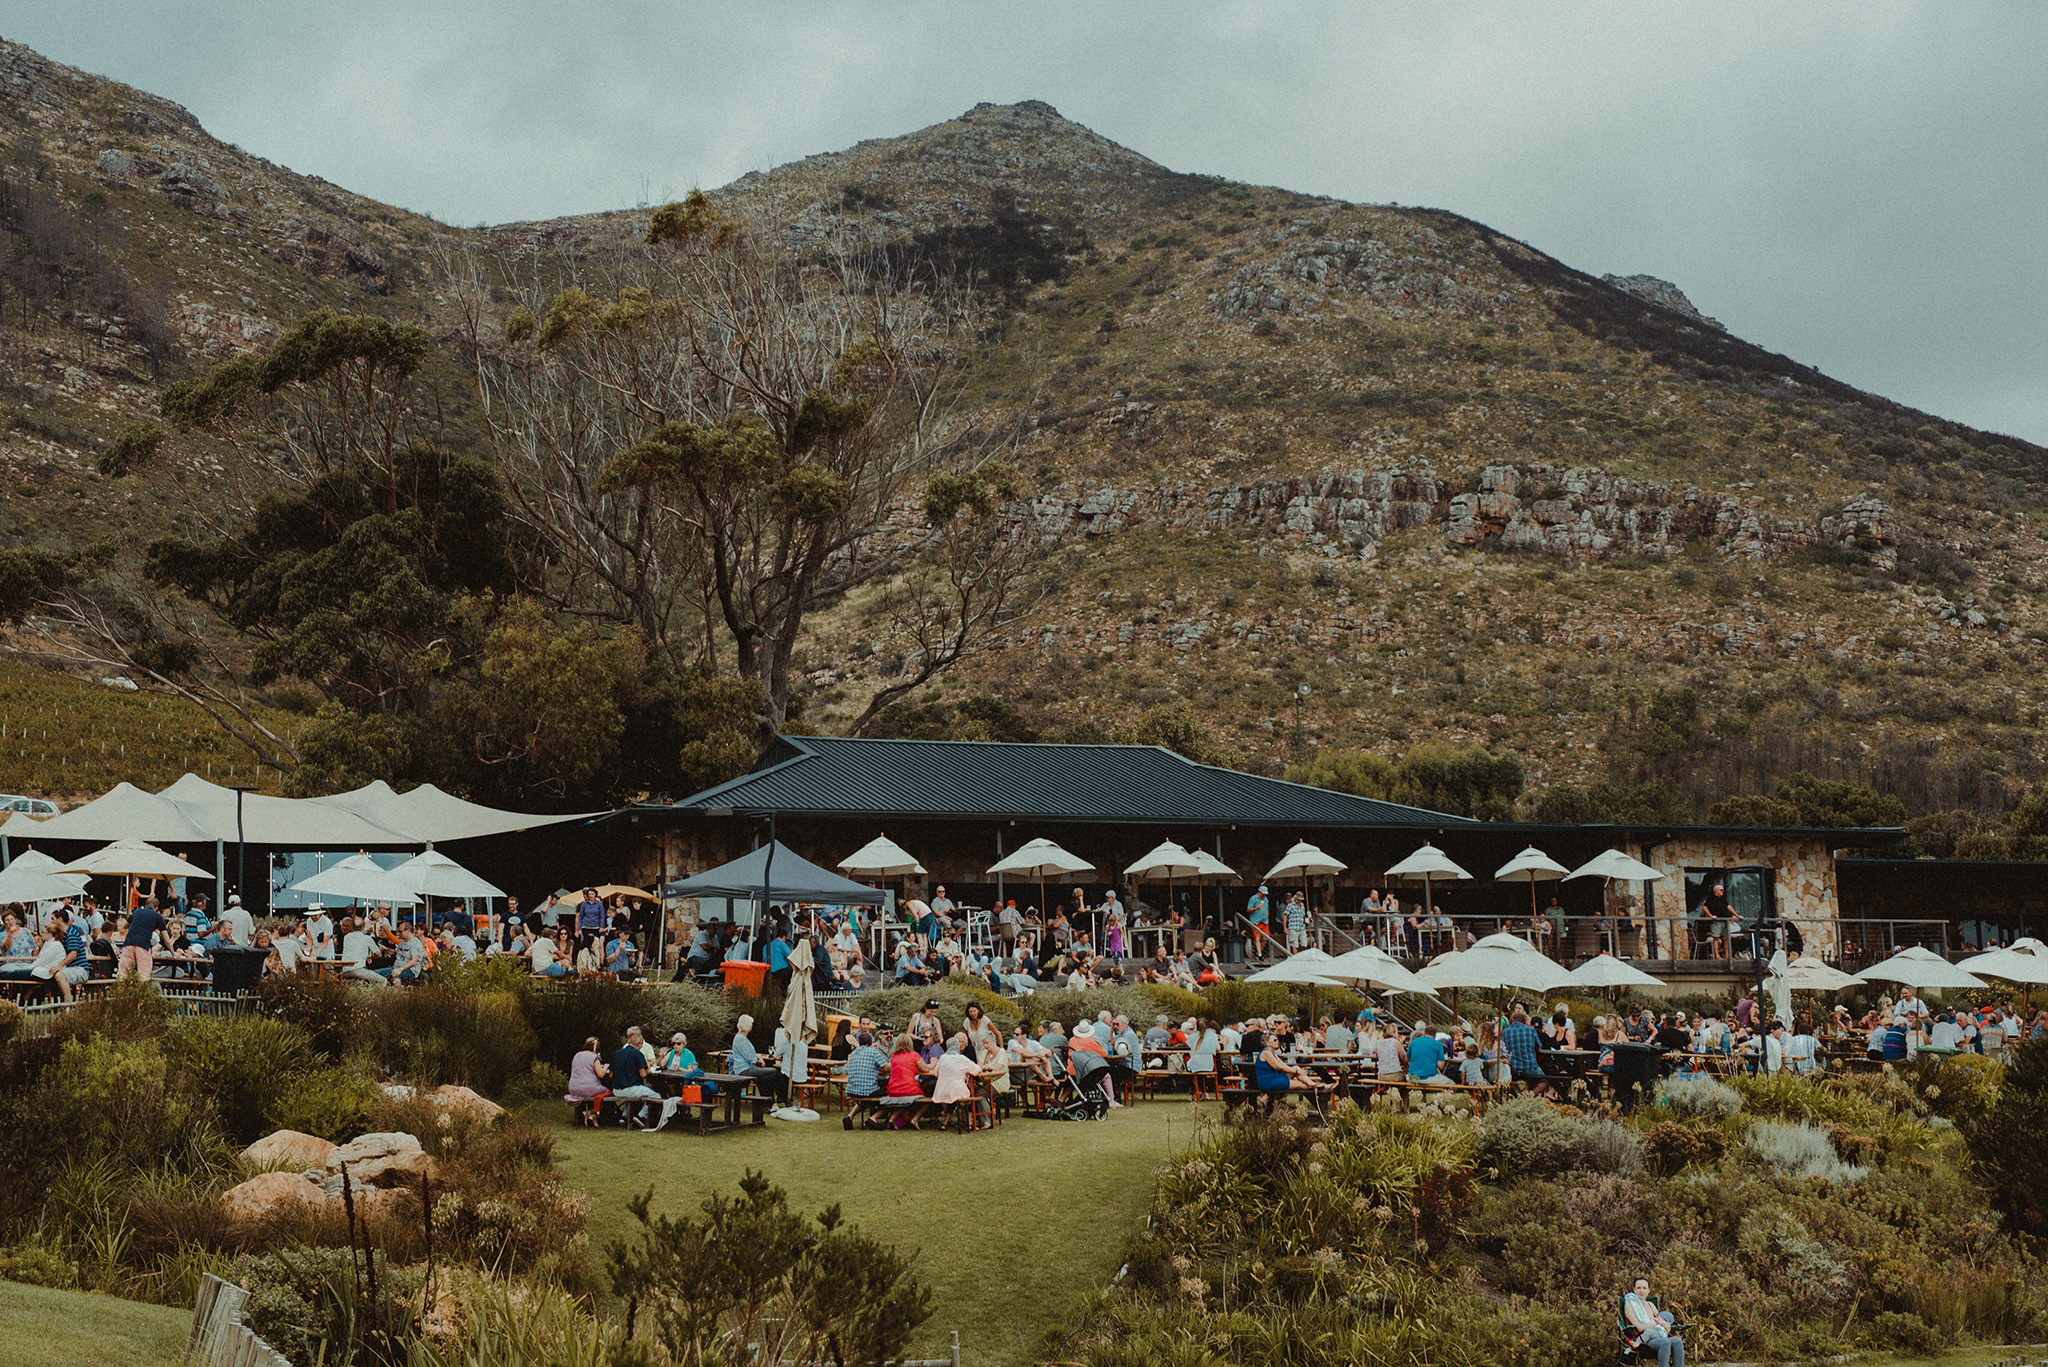 Cape-Point-Vineyards -Thursday-Market-by-Polina-Ilieva-Photography-Tripsesh-Travel-blog